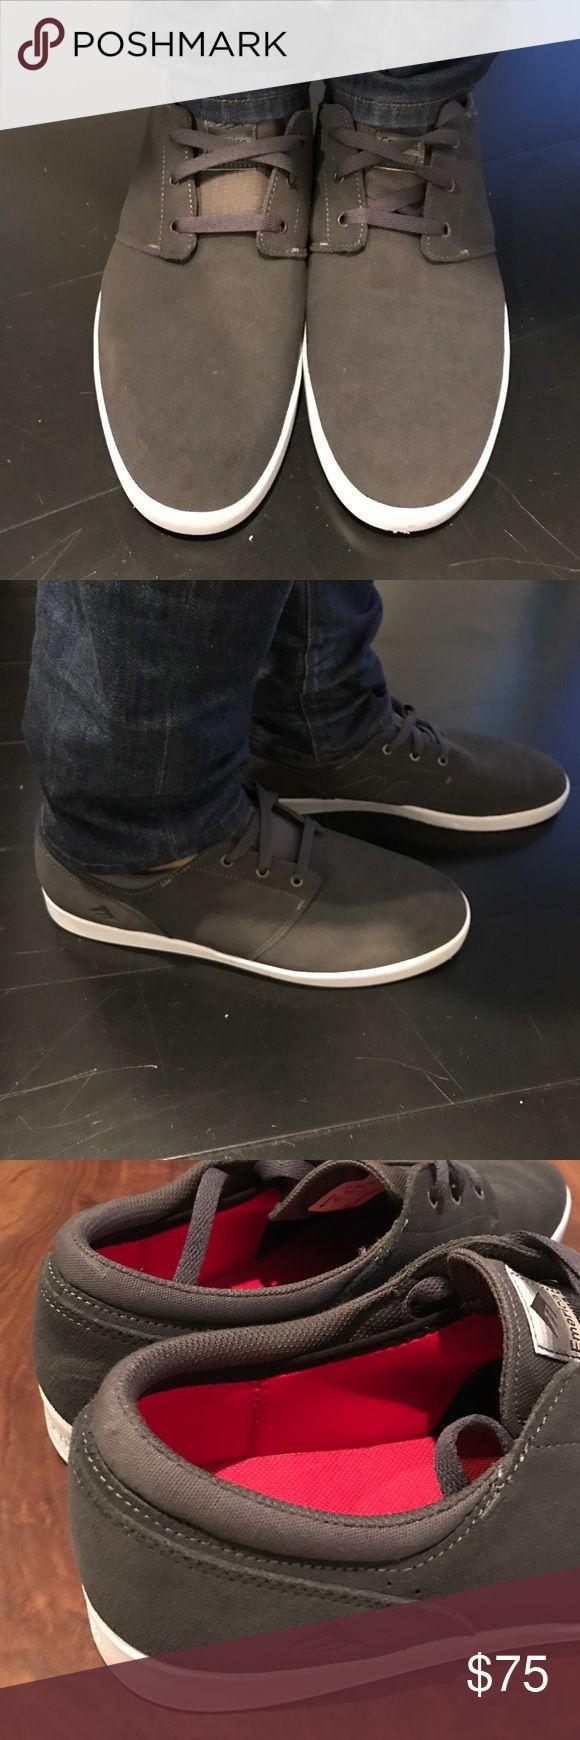 Emerica Figueroa active sneakers 👟 👟 Emerica Figueroa active sneakers. Skate shoes, brand new!! emerica Shoes Sneakers